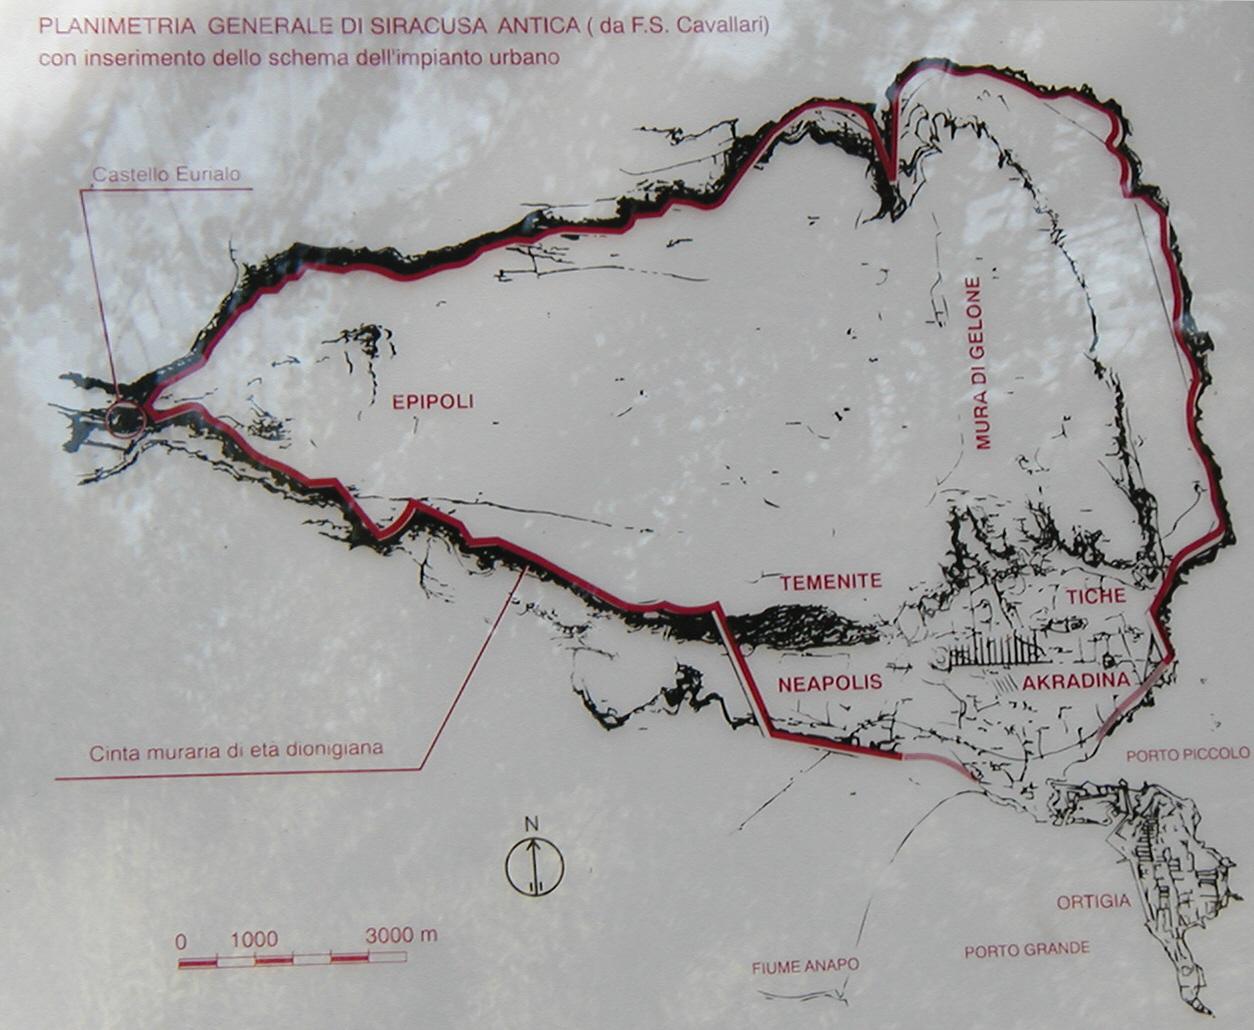 Mappa mura dionigiane - Siracusa